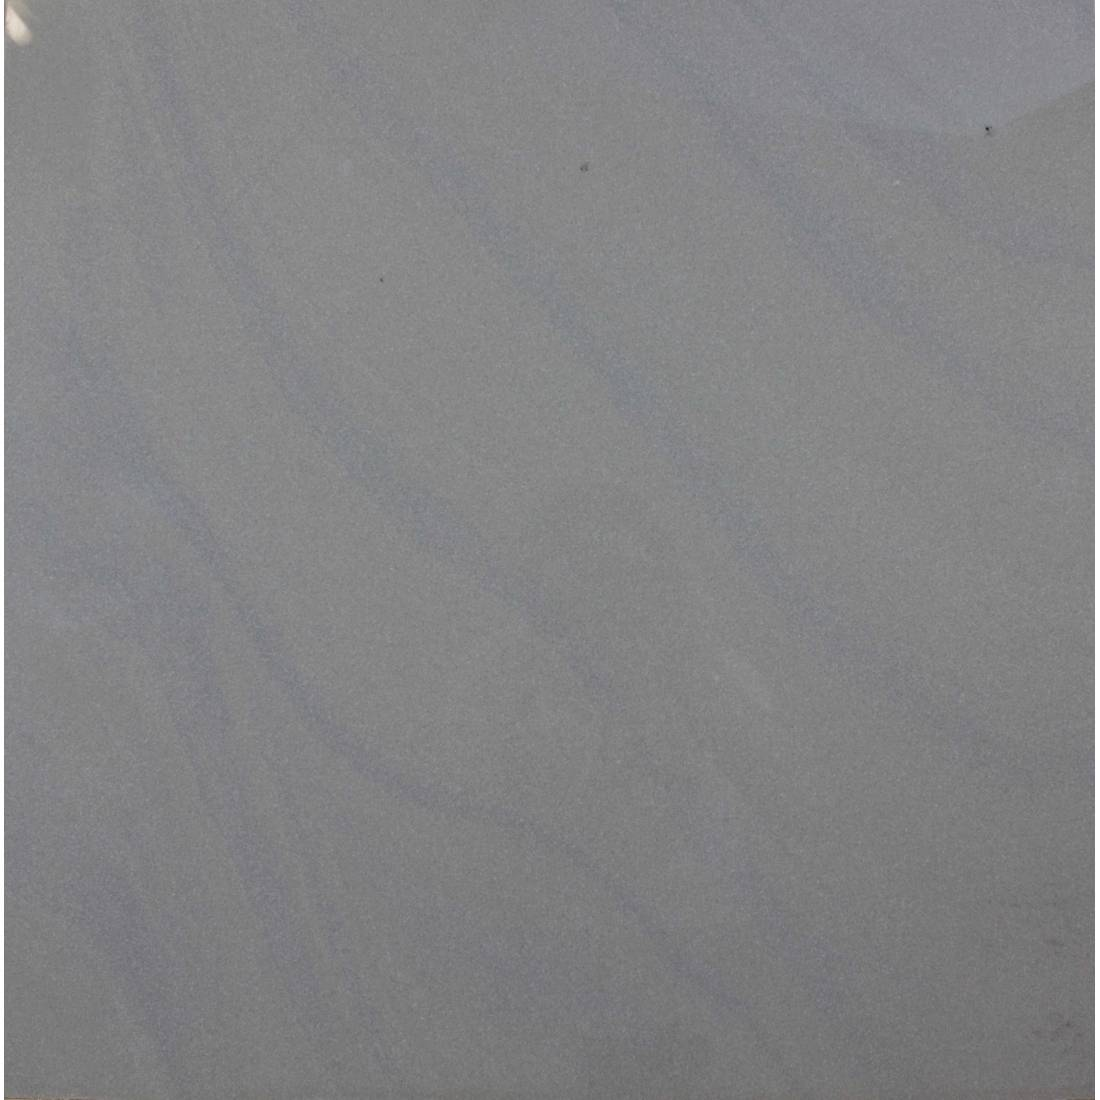 Genesis 60x60 Grey Polished 1